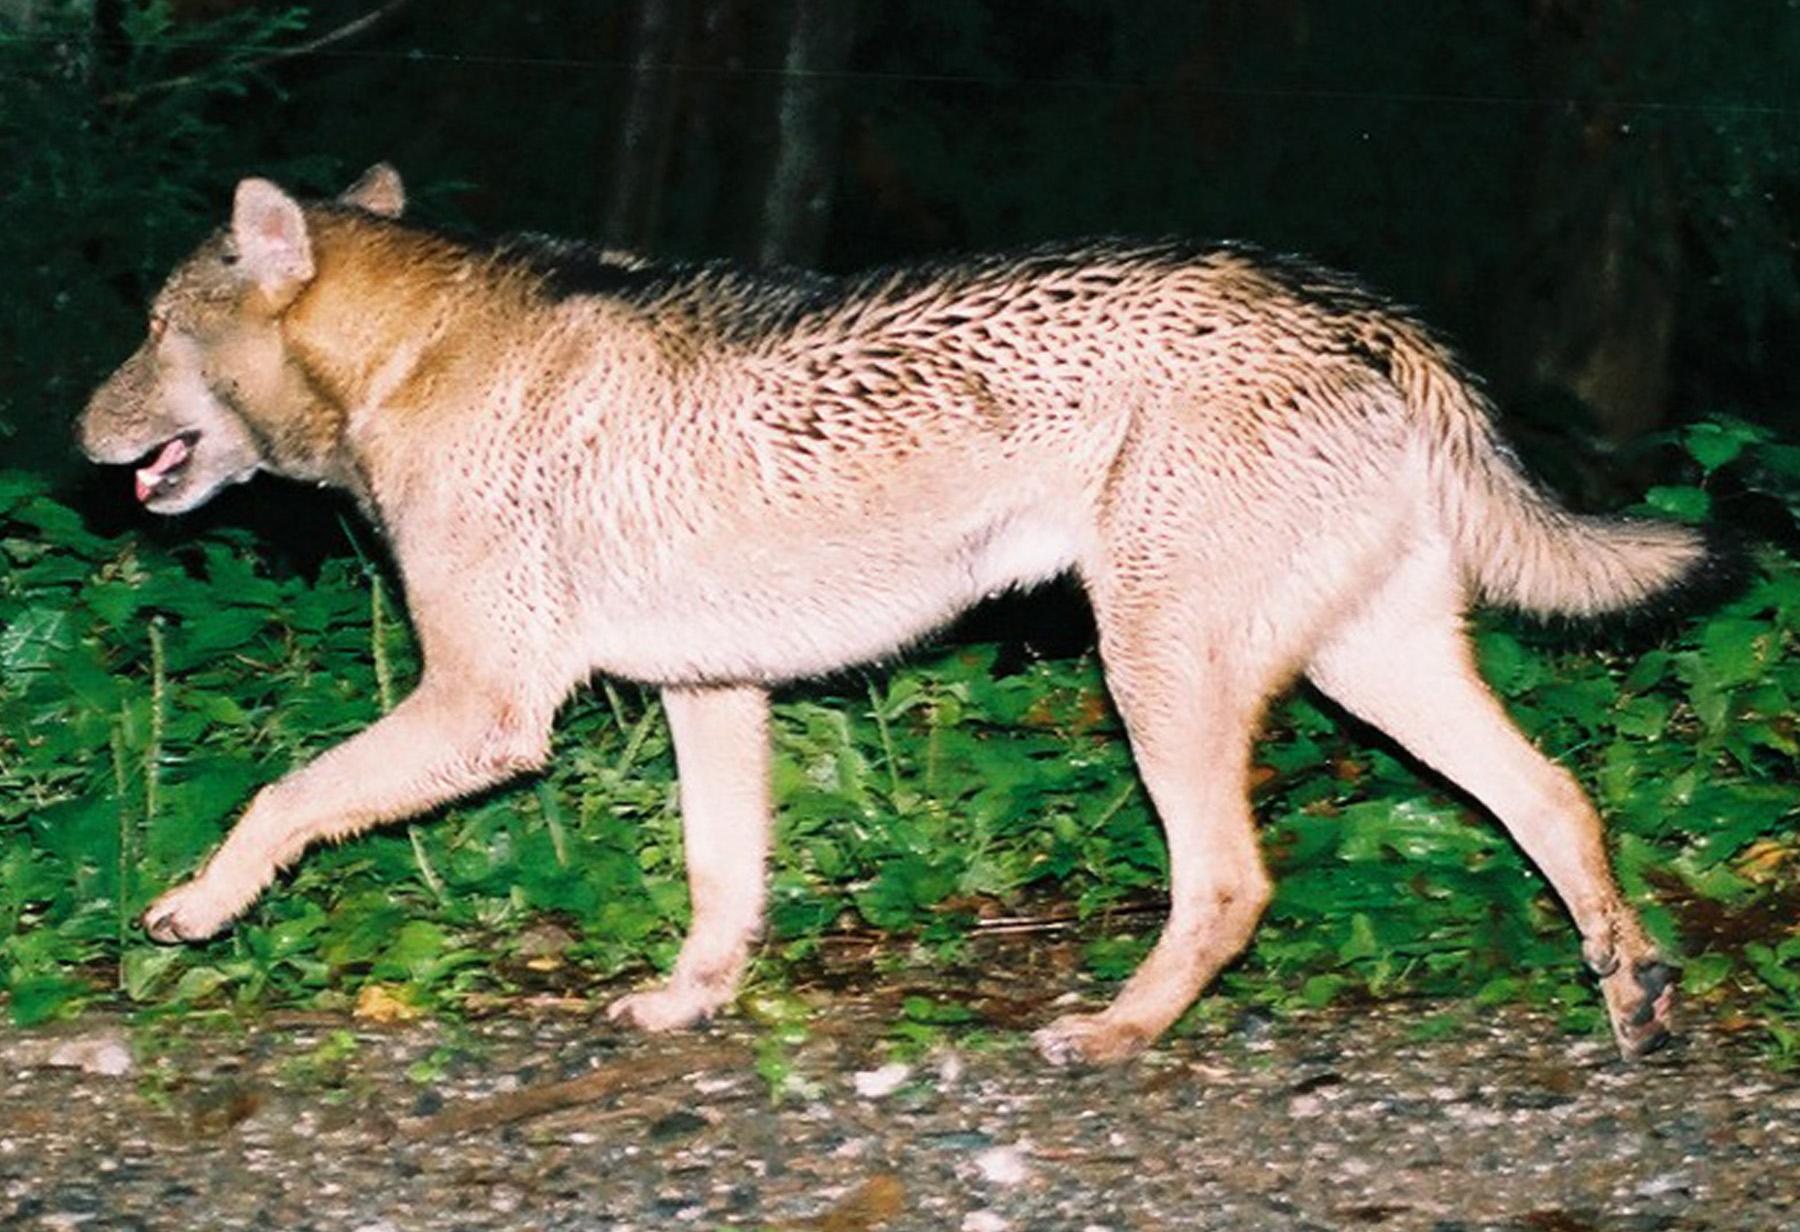 One of the 19 photographs of the wolf-like Chichibu yaken (Chichibu wild dog) shot by Hiroshi Yagi in the mountains of Chichibu